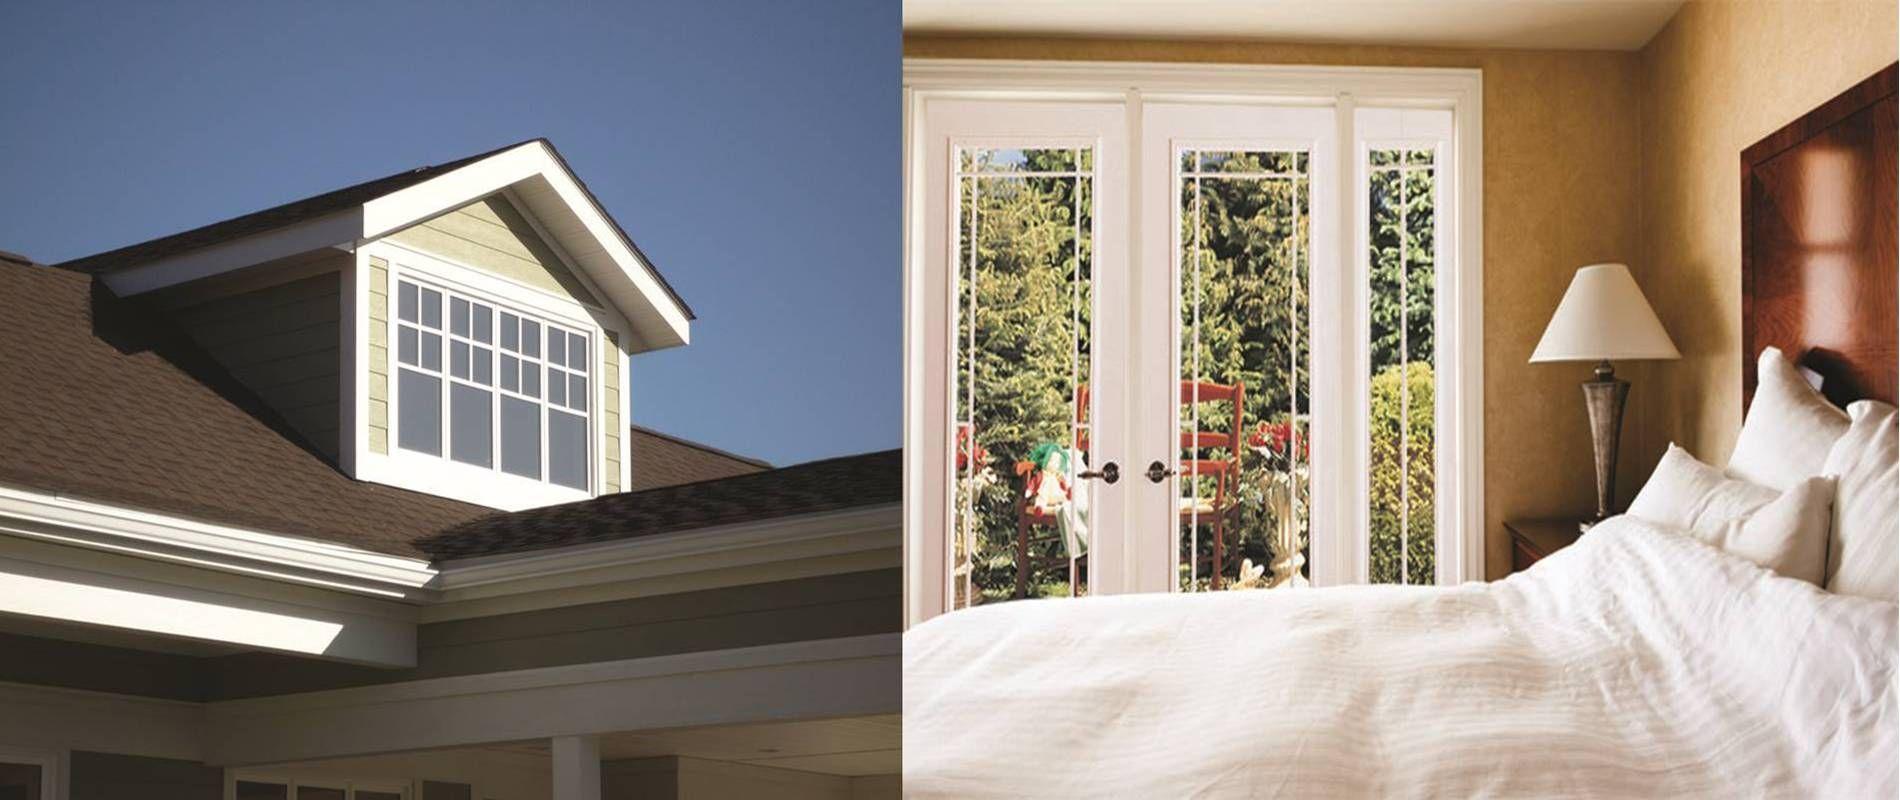 windows and doors winnipeg residential windows and doors in rh pinterest com